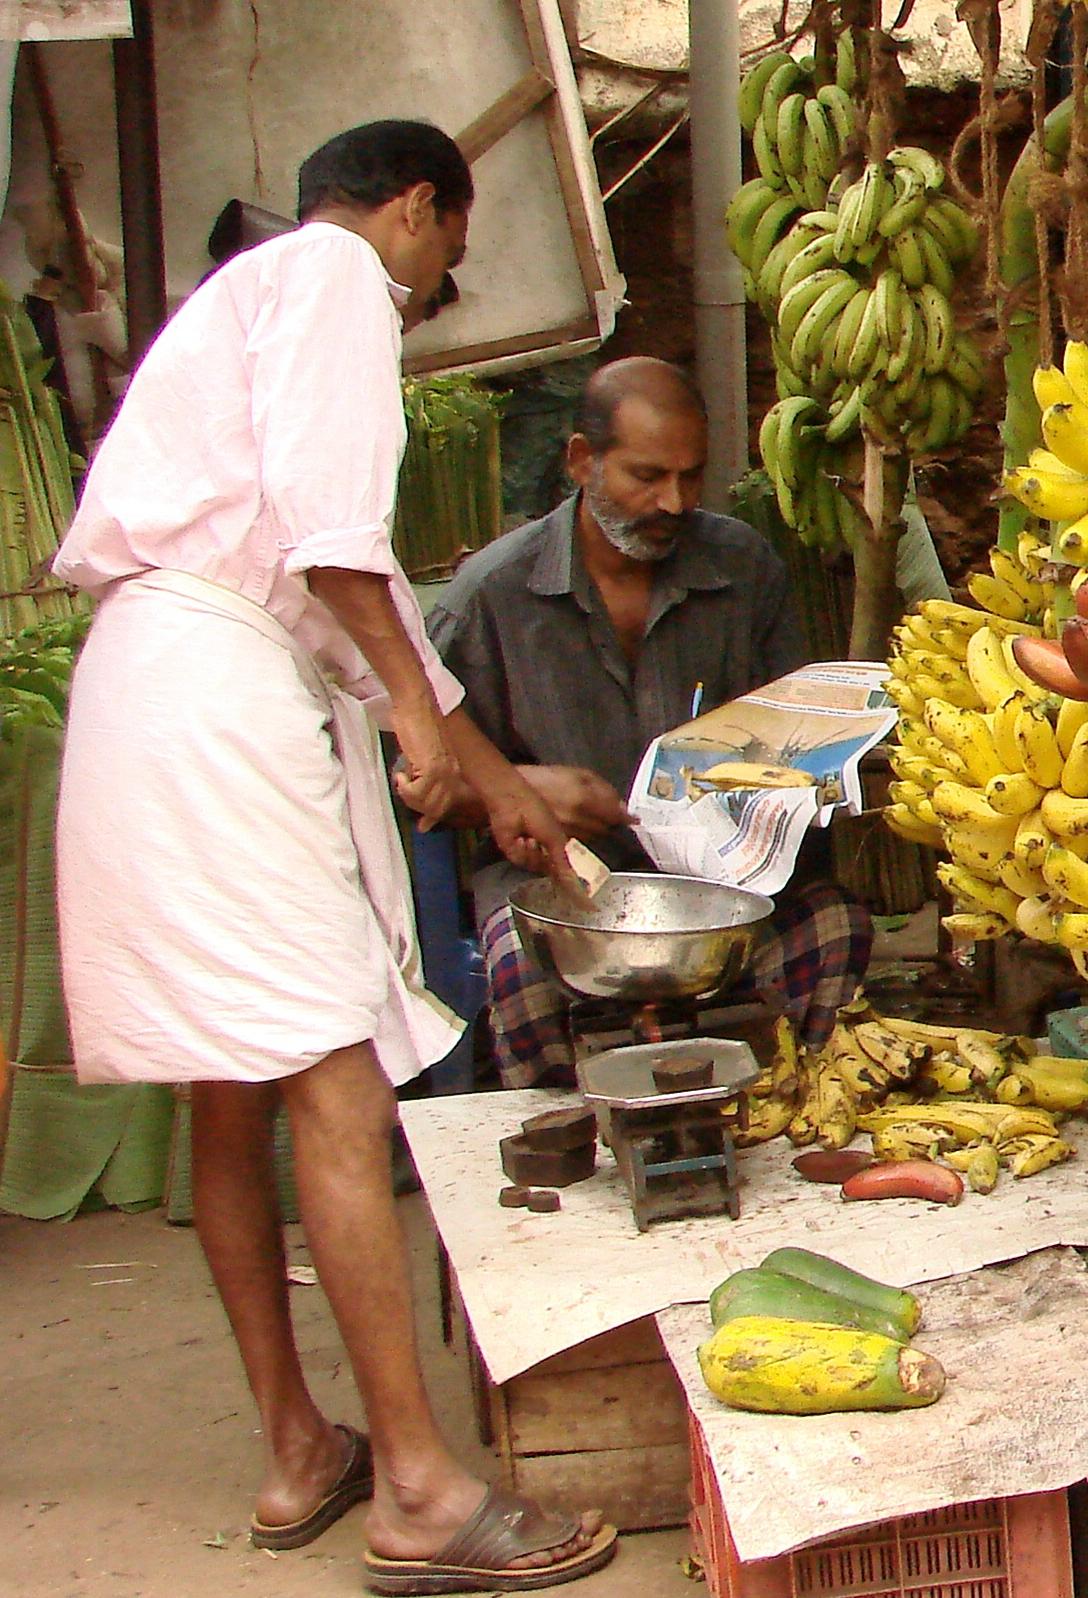 Half Bananas for Sale at Market - Trivandrum - Kerala - India.jpg